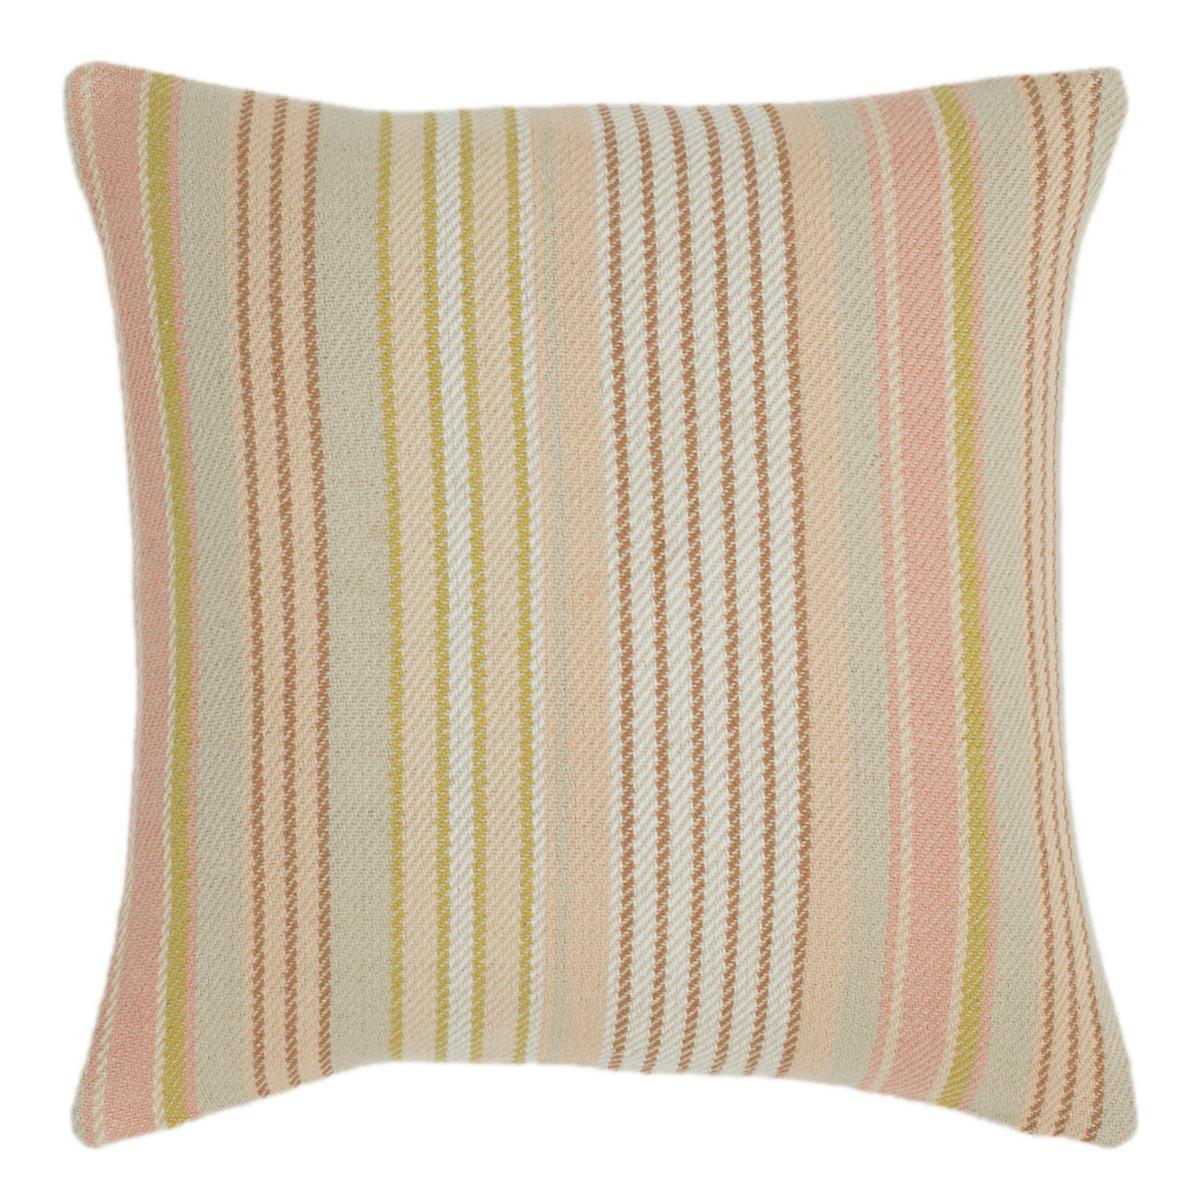 Ana Aqua Ticking Woven Cotton Decorative Pillow